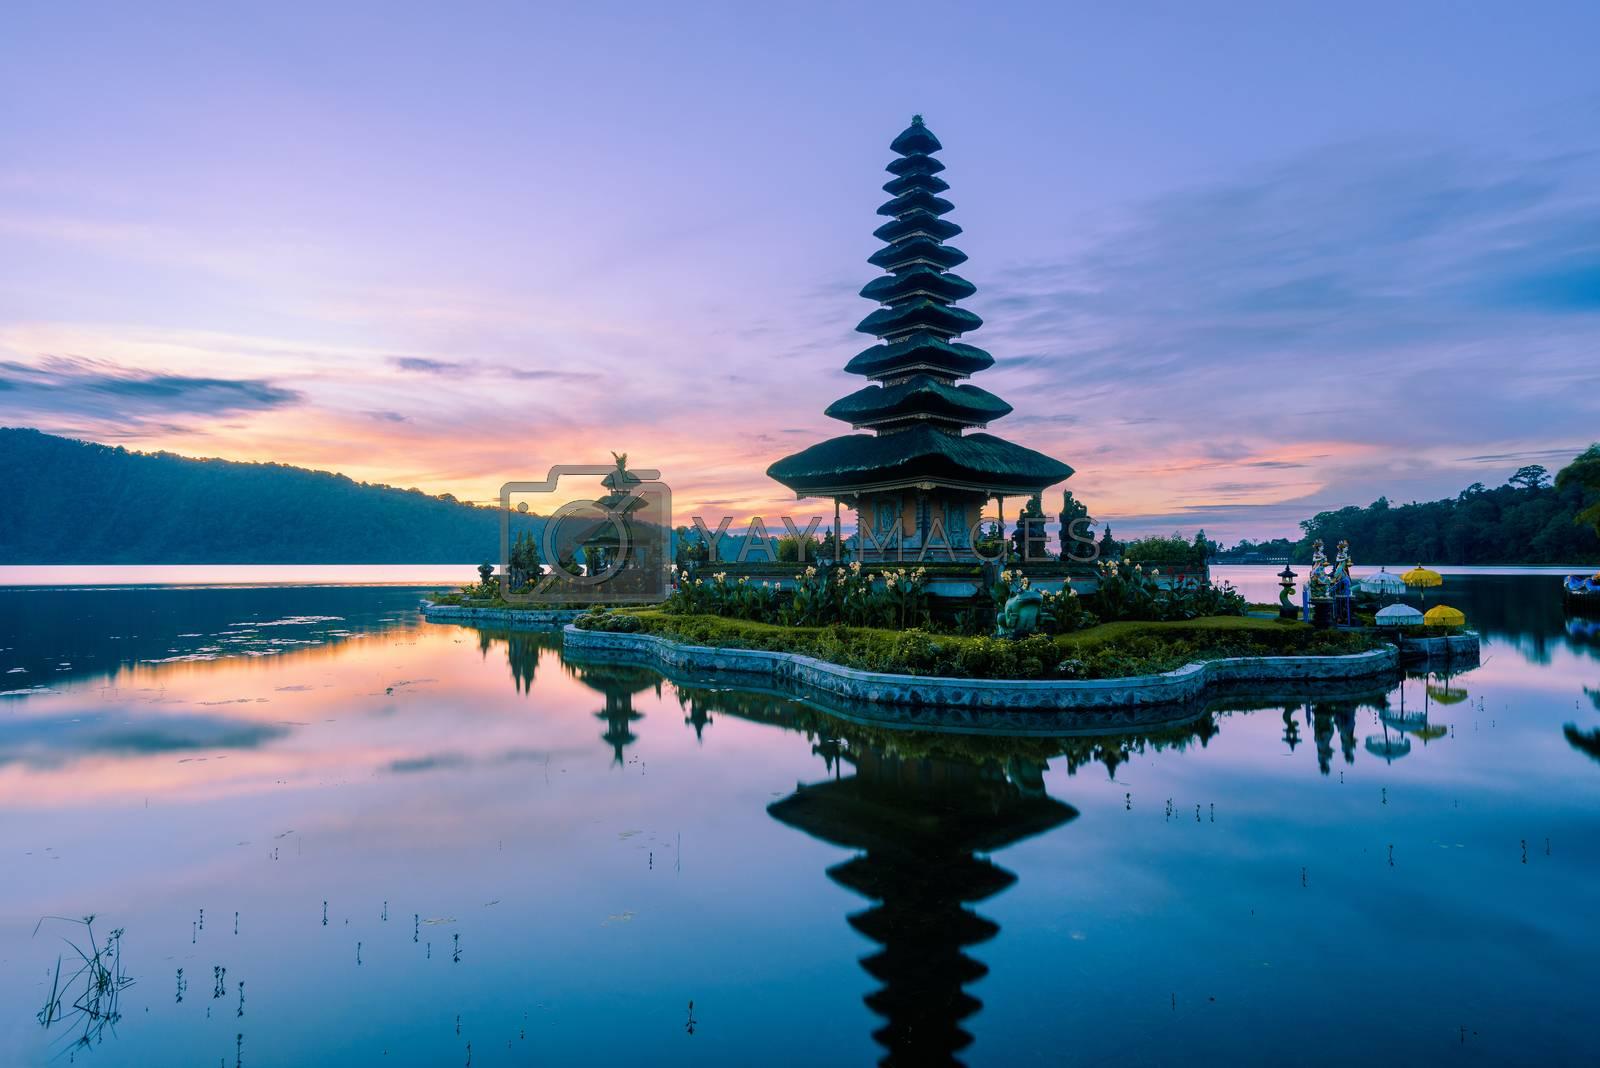 Pura Ulun Danu Beratan temple at sunrise in Bali, Indonesia